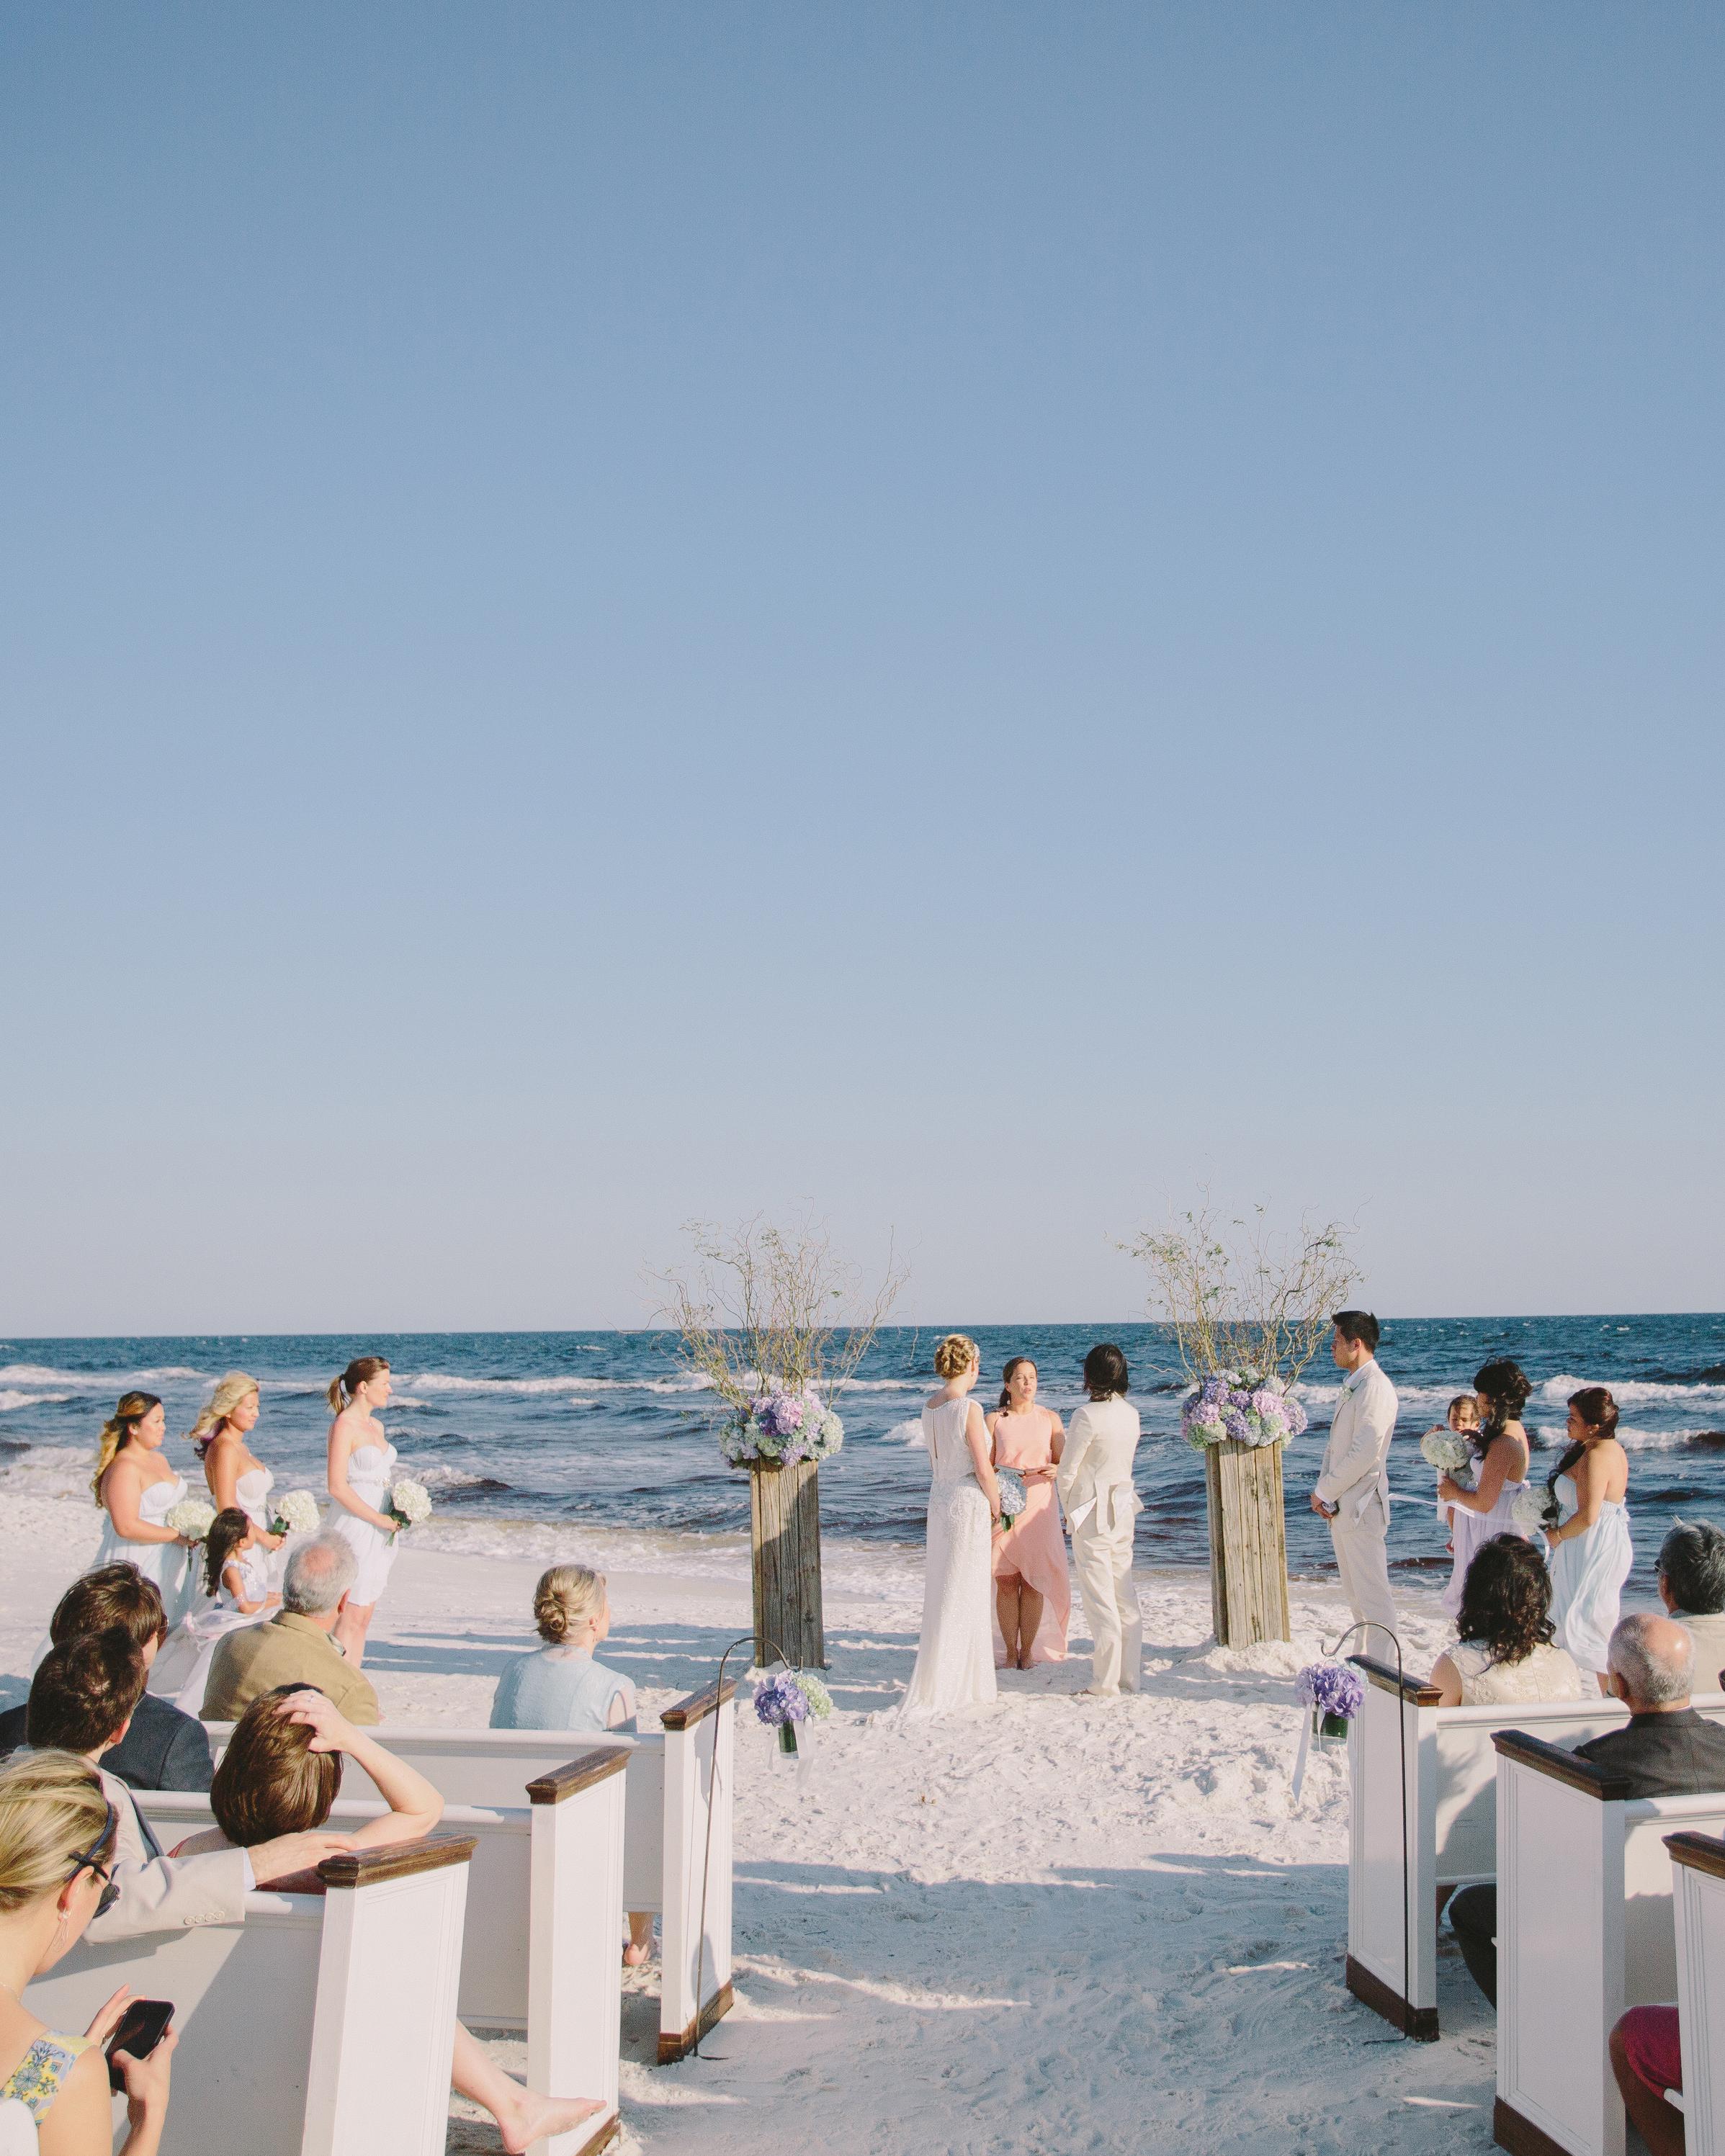 teresa-amanda-wedding-ceremony-9787-s111694-1114.jpg